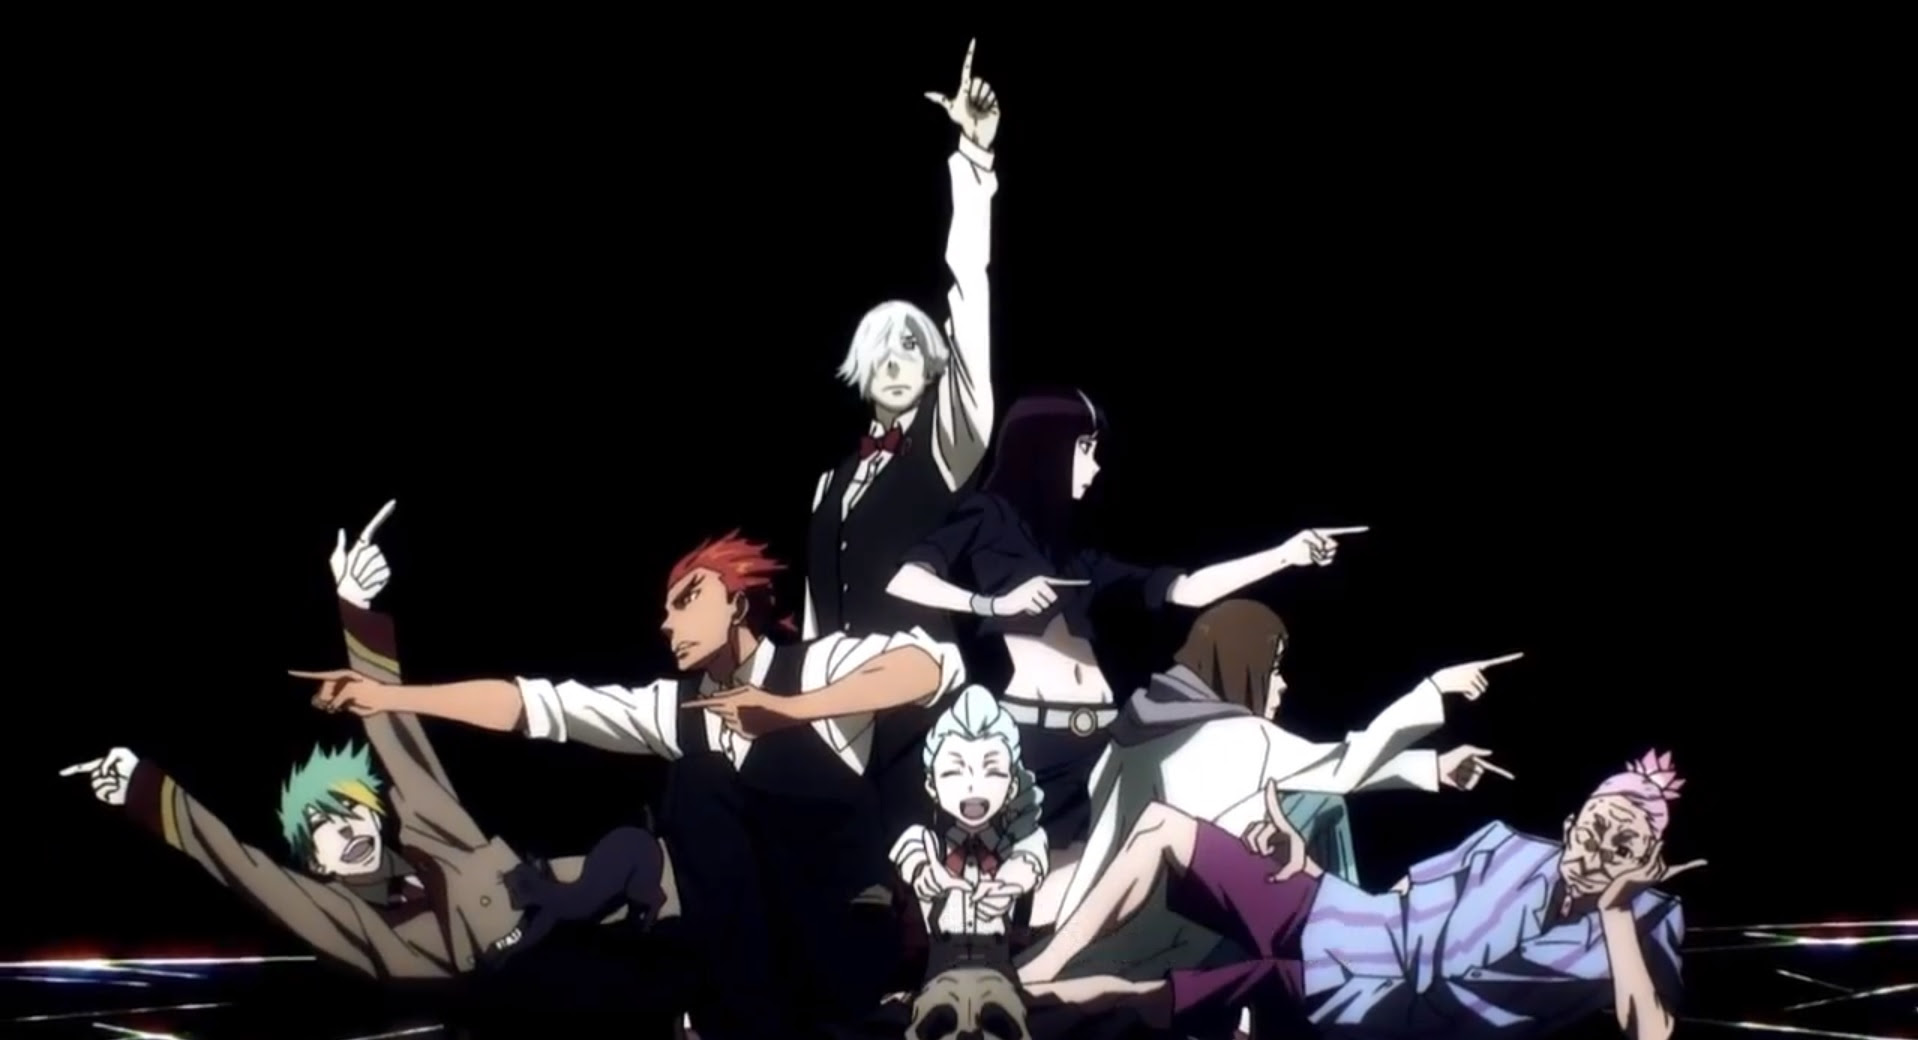 Death Parade Anime Instrumentality